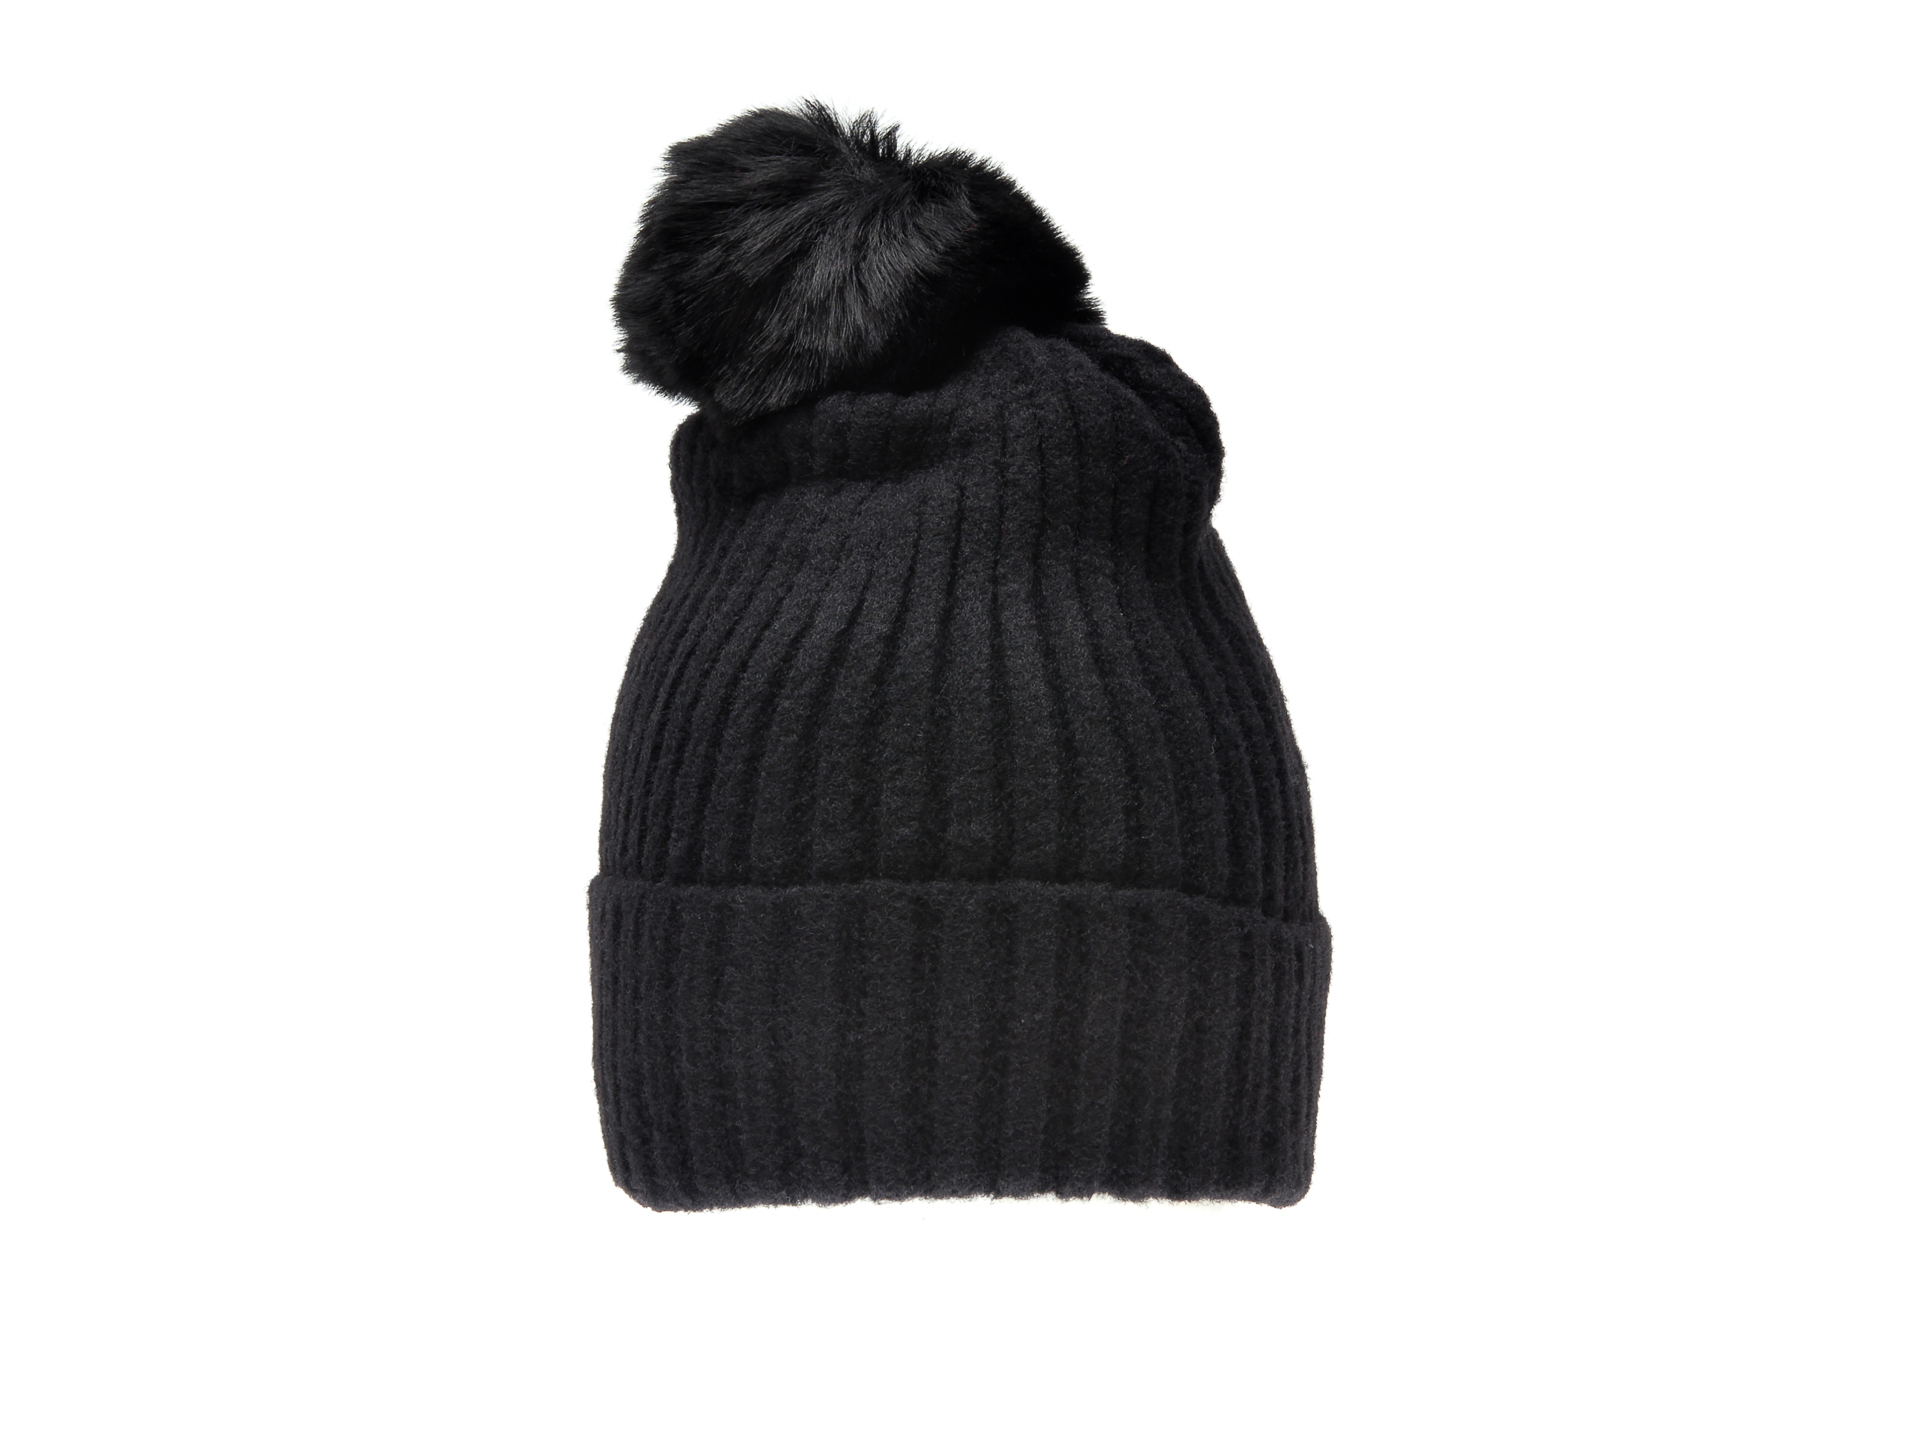 Caciula GRYXX neagra, 500, din material textil imagine